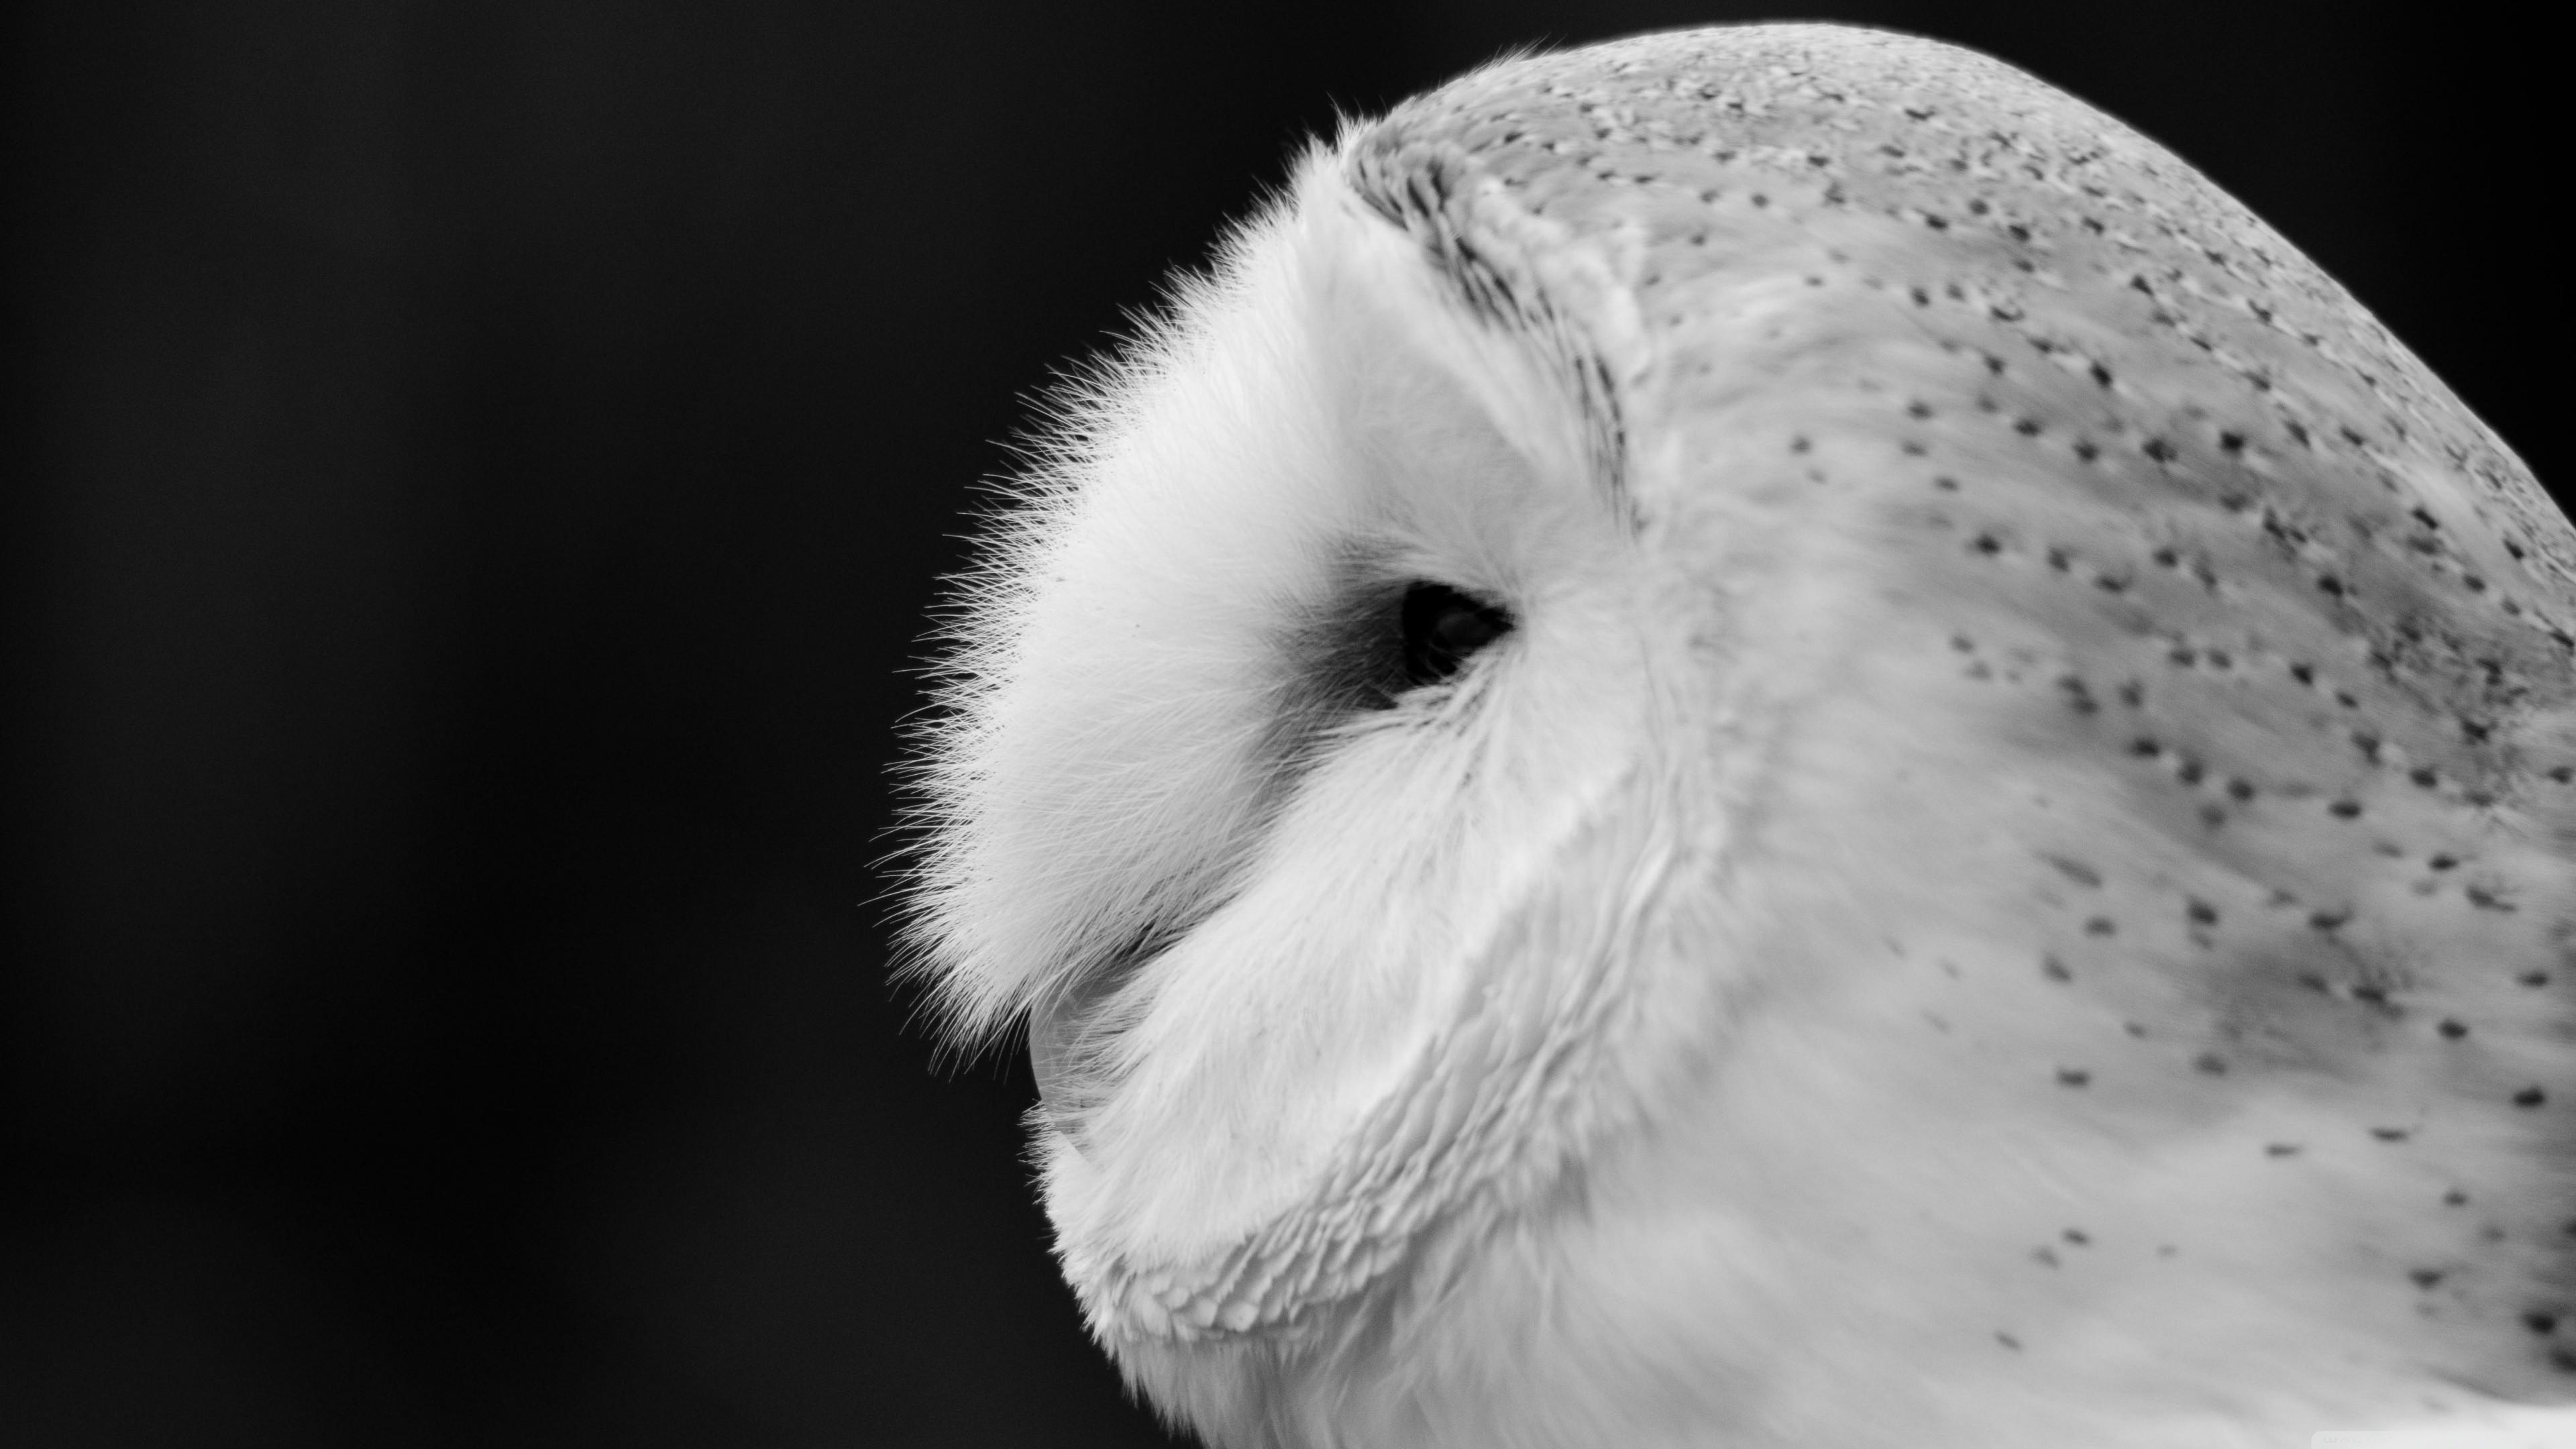 Res: 3840x2160, 4k Closeup White Barn Owl Wallpaper for desktop and mobile phones.